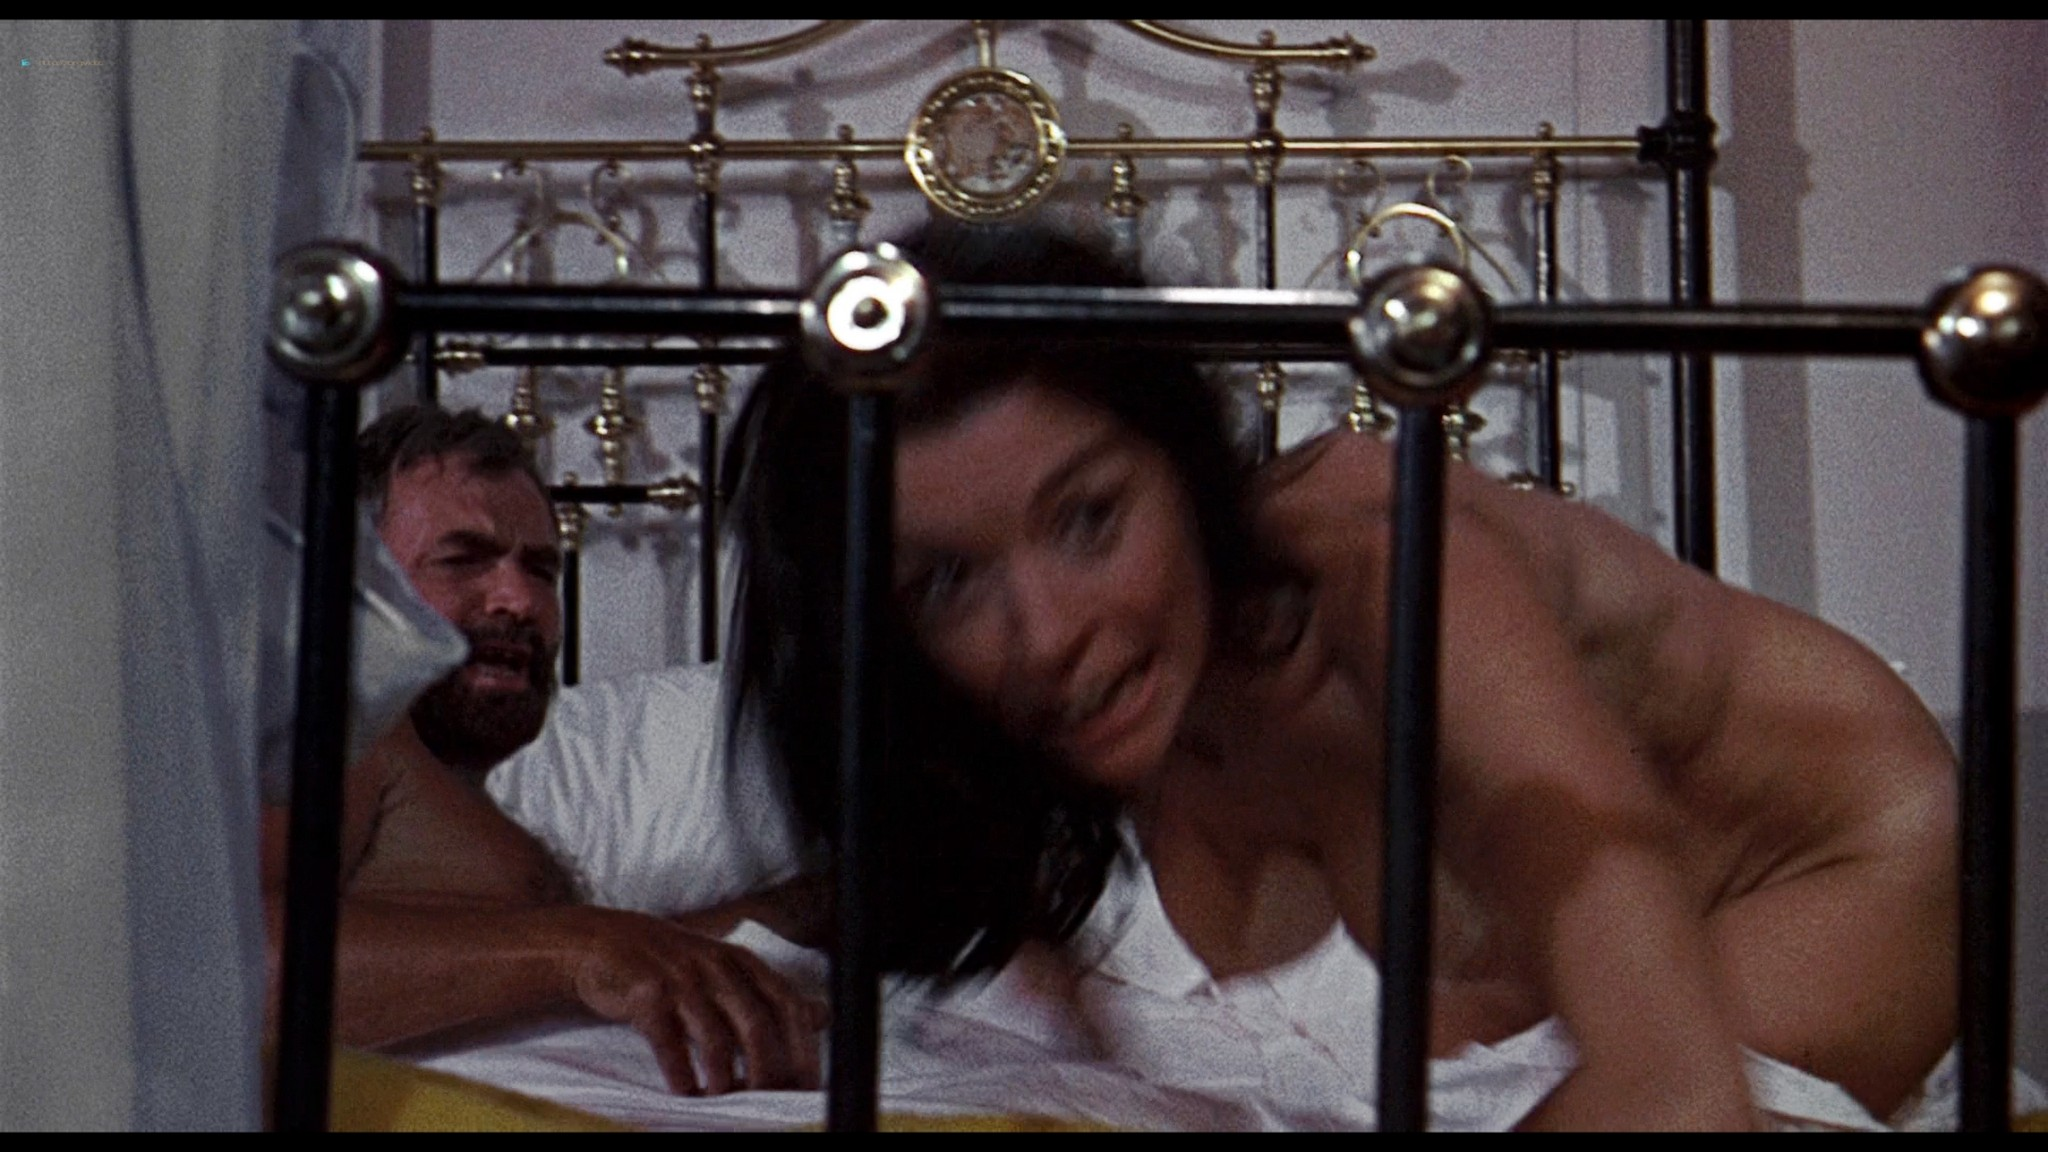 Helen Mirren nude skinny dipping Clarissa Kaye-Mason nude sex - Age of Consent (1969) HD 1080p BluRay Remux (18)